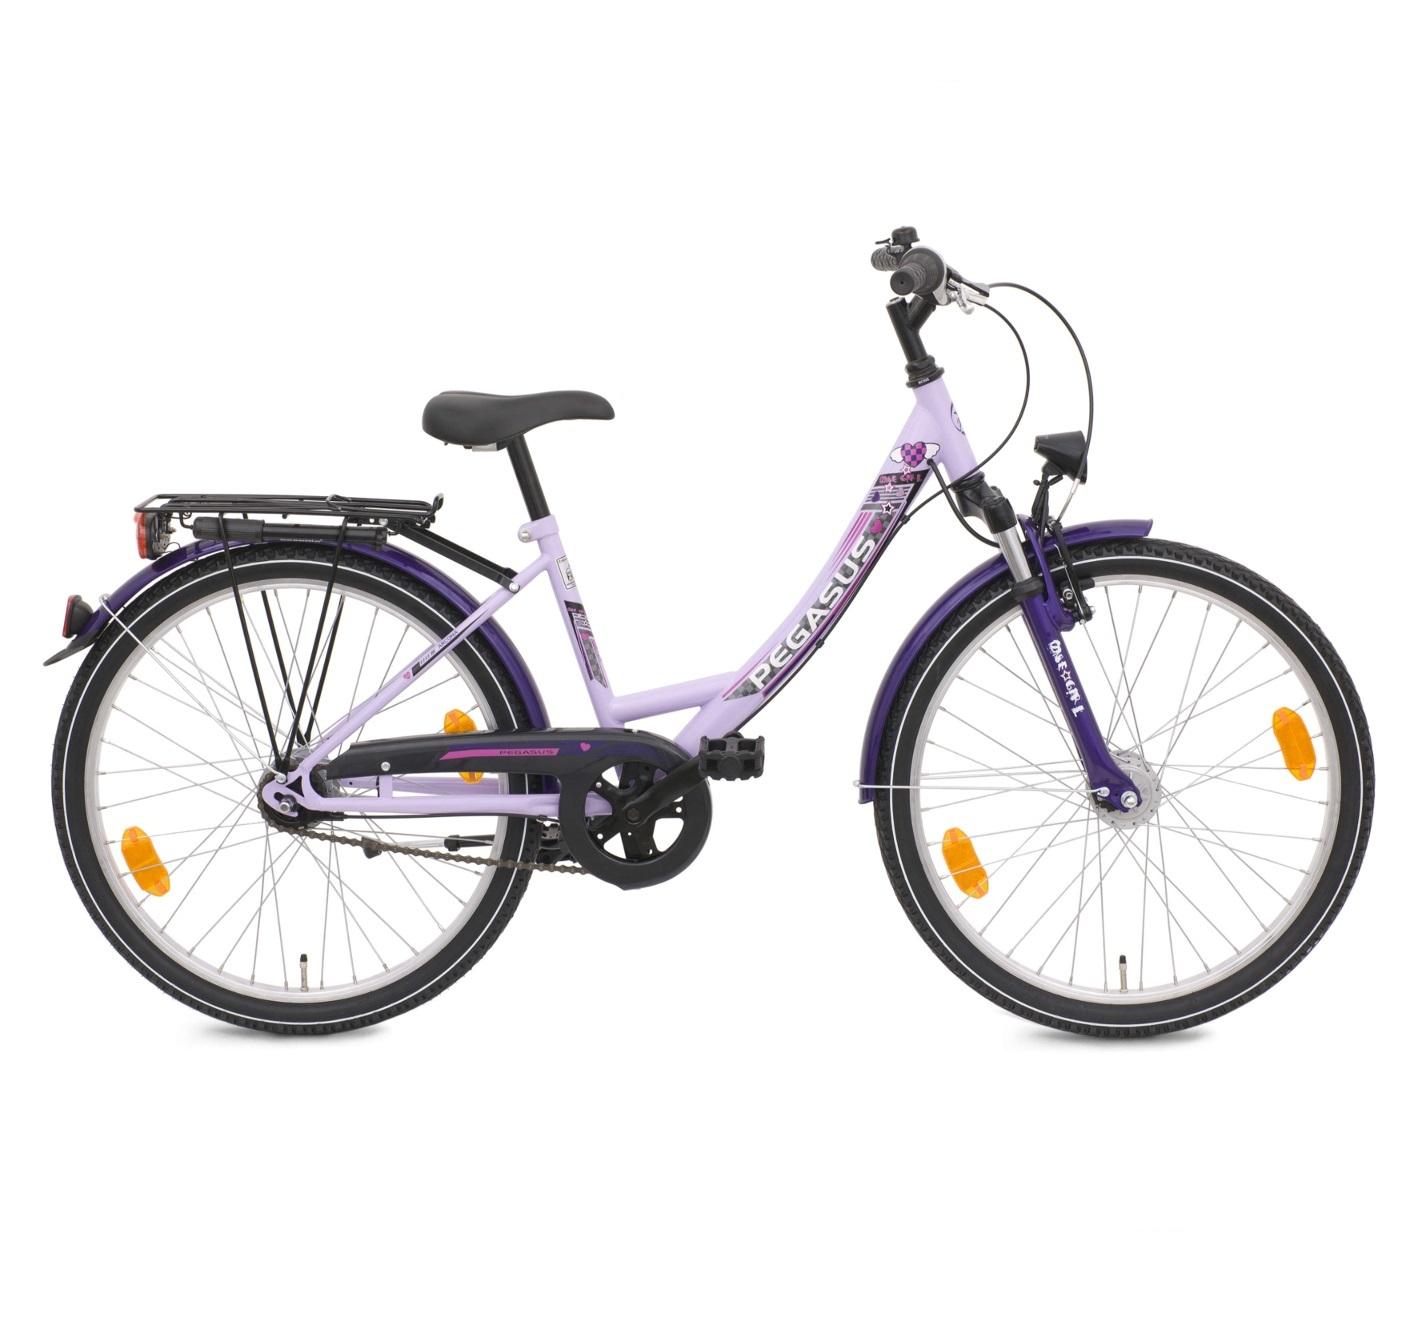 fahrrad pegasus arcona fg nd 26 zoll m dchen city bike. Black Bedroom Furniture Sets. Home Design Ideas